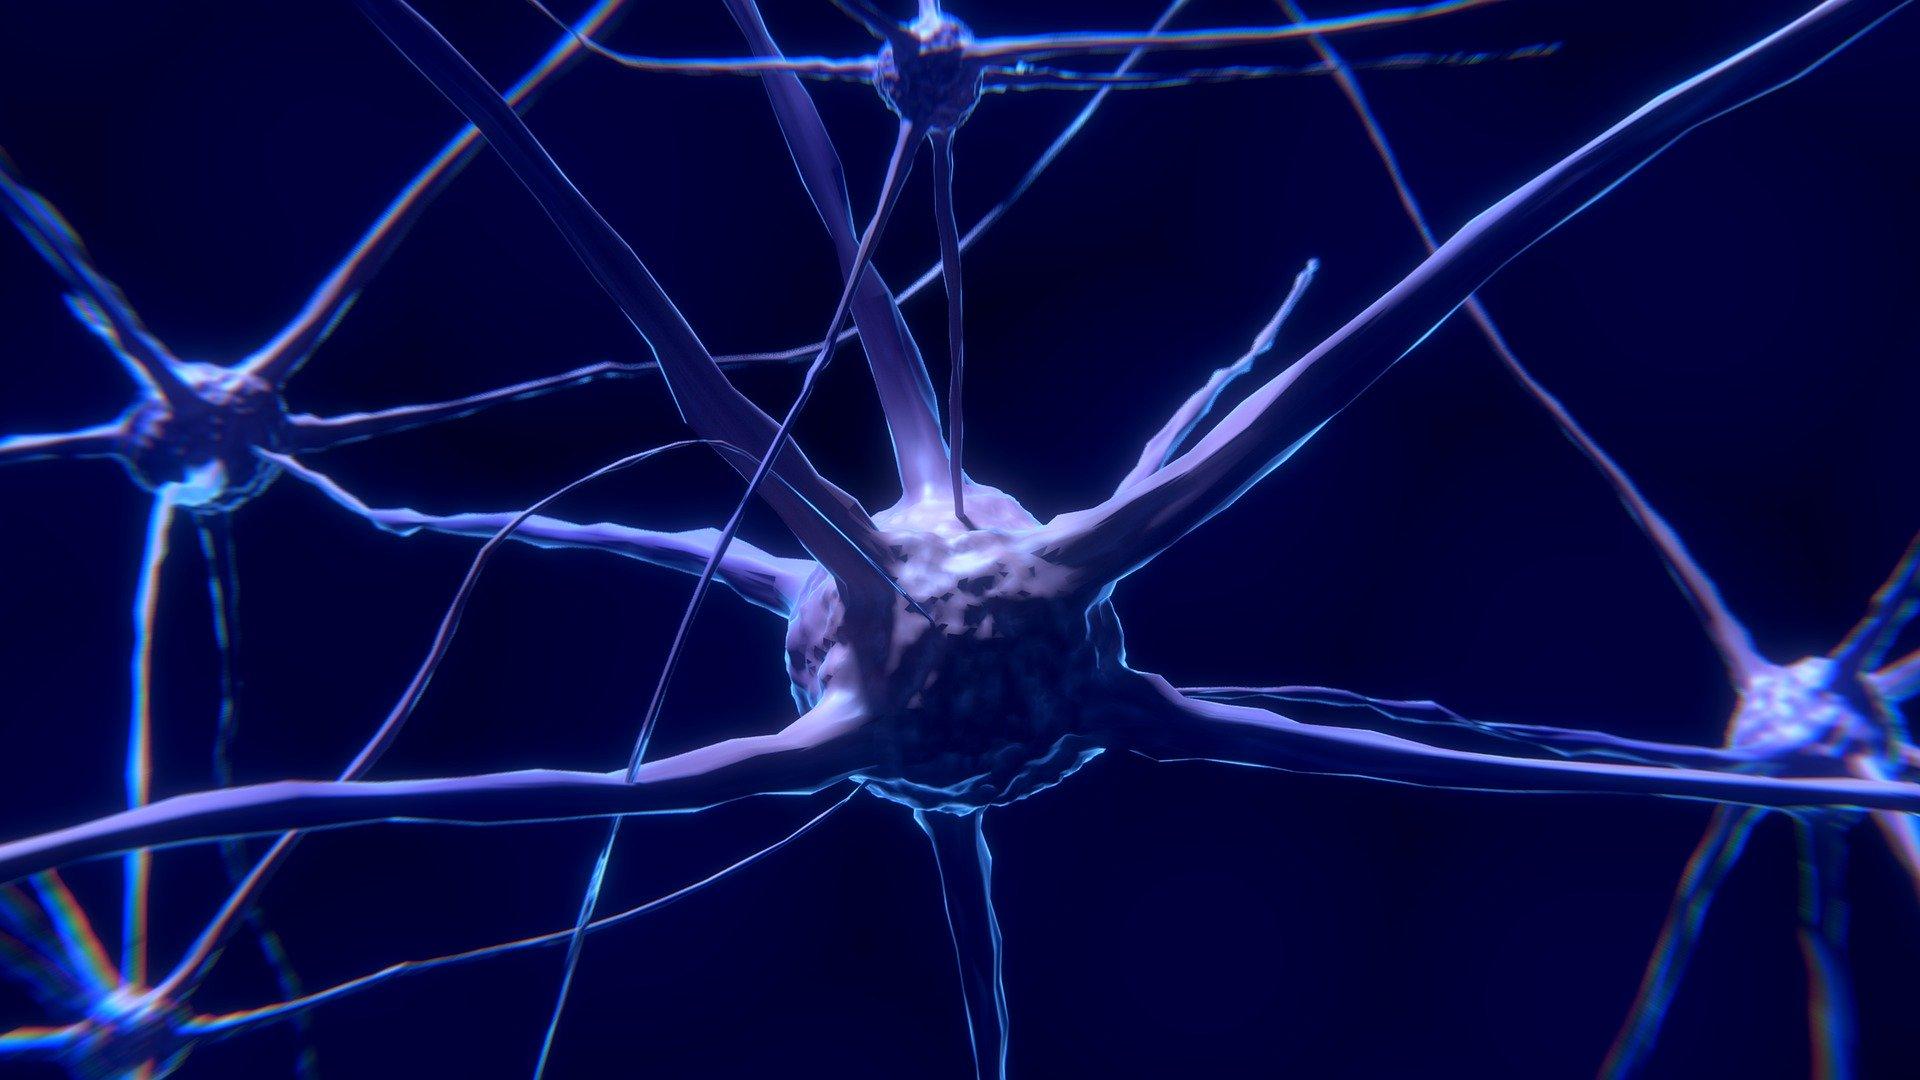 ERA-NET NEURON Preannouncement of 2020 Calls on Neuroethics and Sensory Disorders